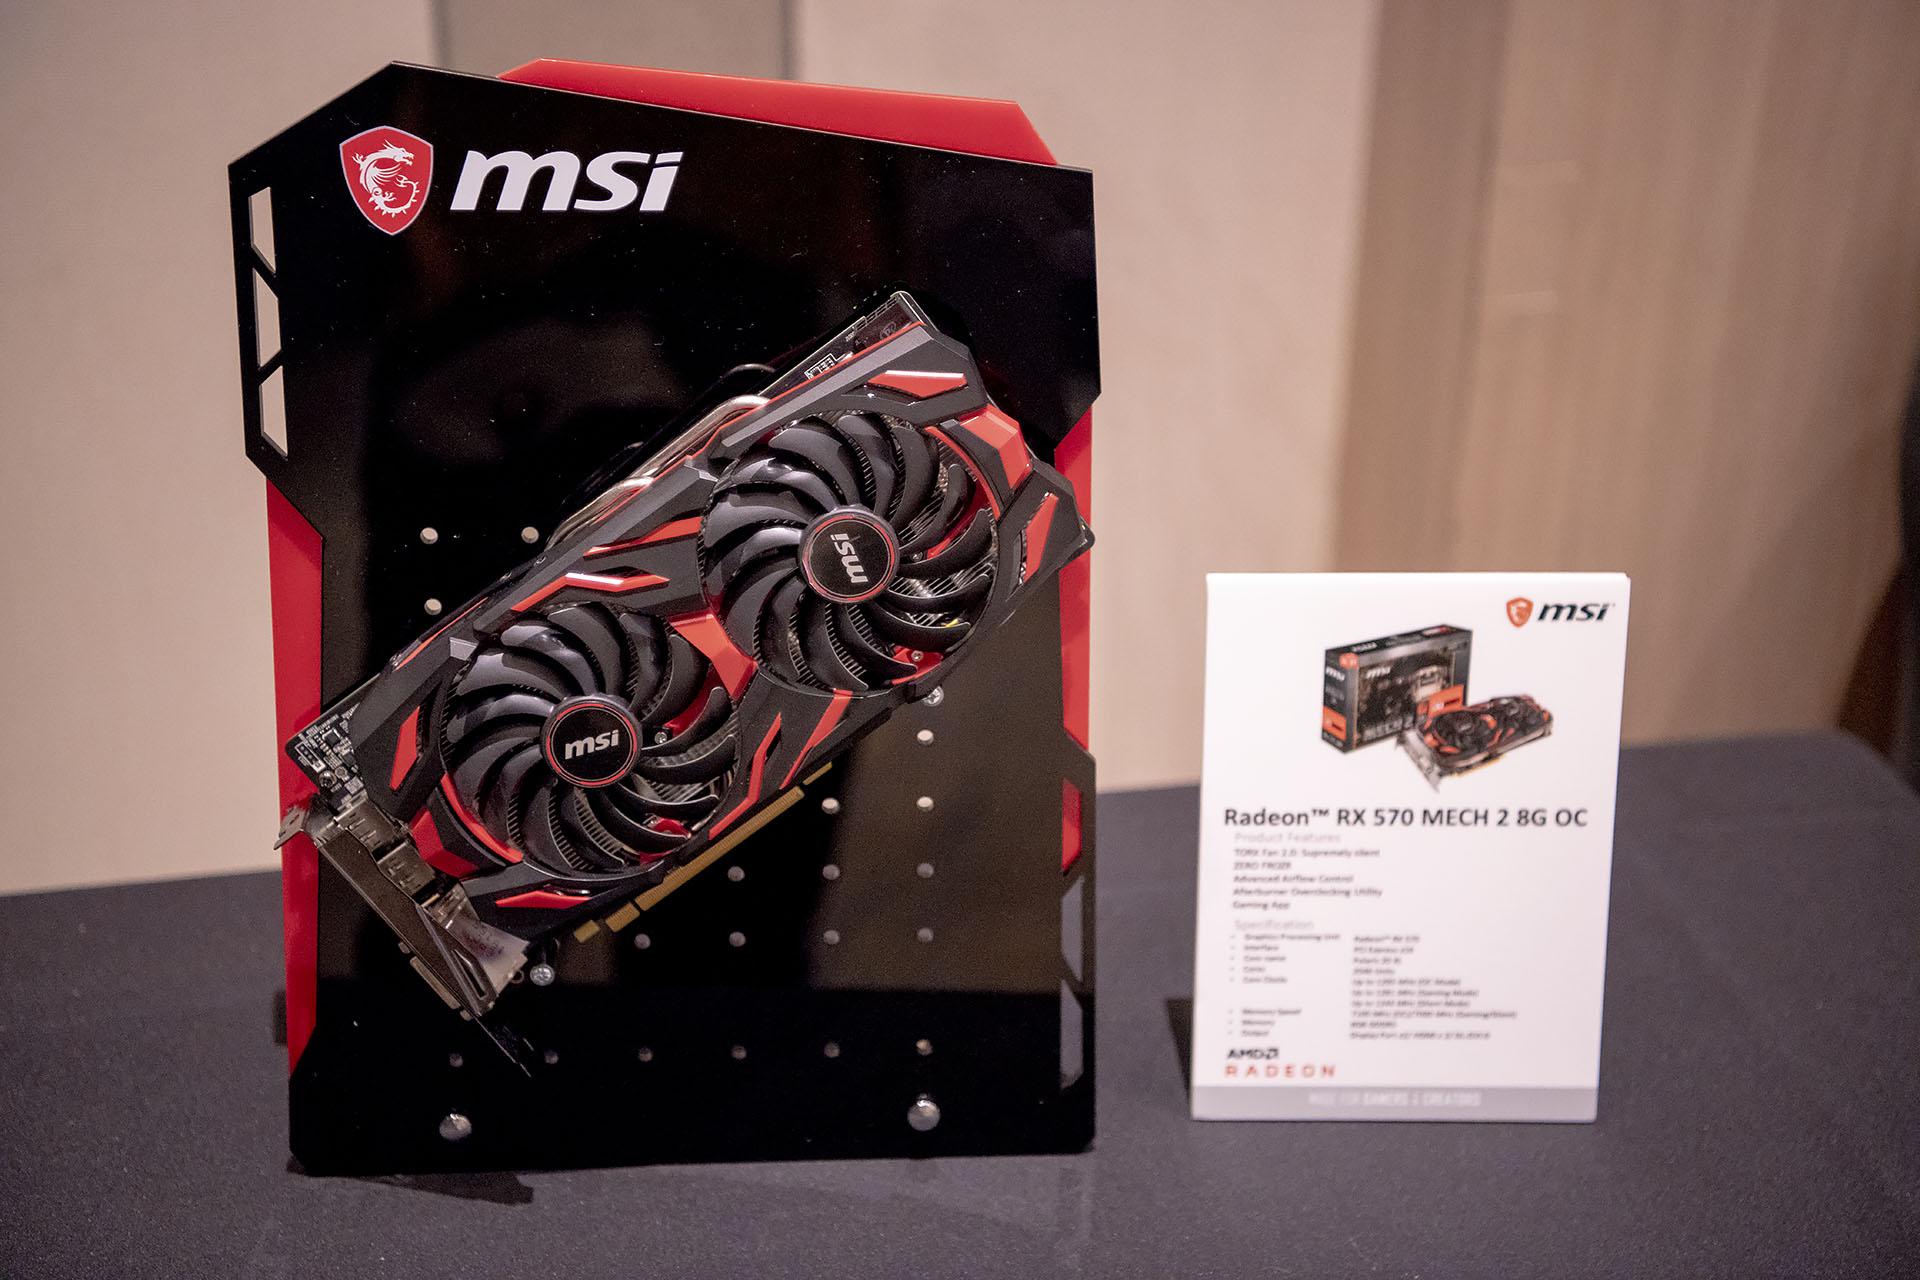 dsc 4773 บรรยากาศงาน MSI Indo Pacific X570 Partner Convention พบการเปิดตัวเมนบอร์ด X570 รุ่นใหม่ล่าสุดจากทาง MSI ต้อนรับการมาของซีพียู AMD RYZEN 3000ซีรี่ย์